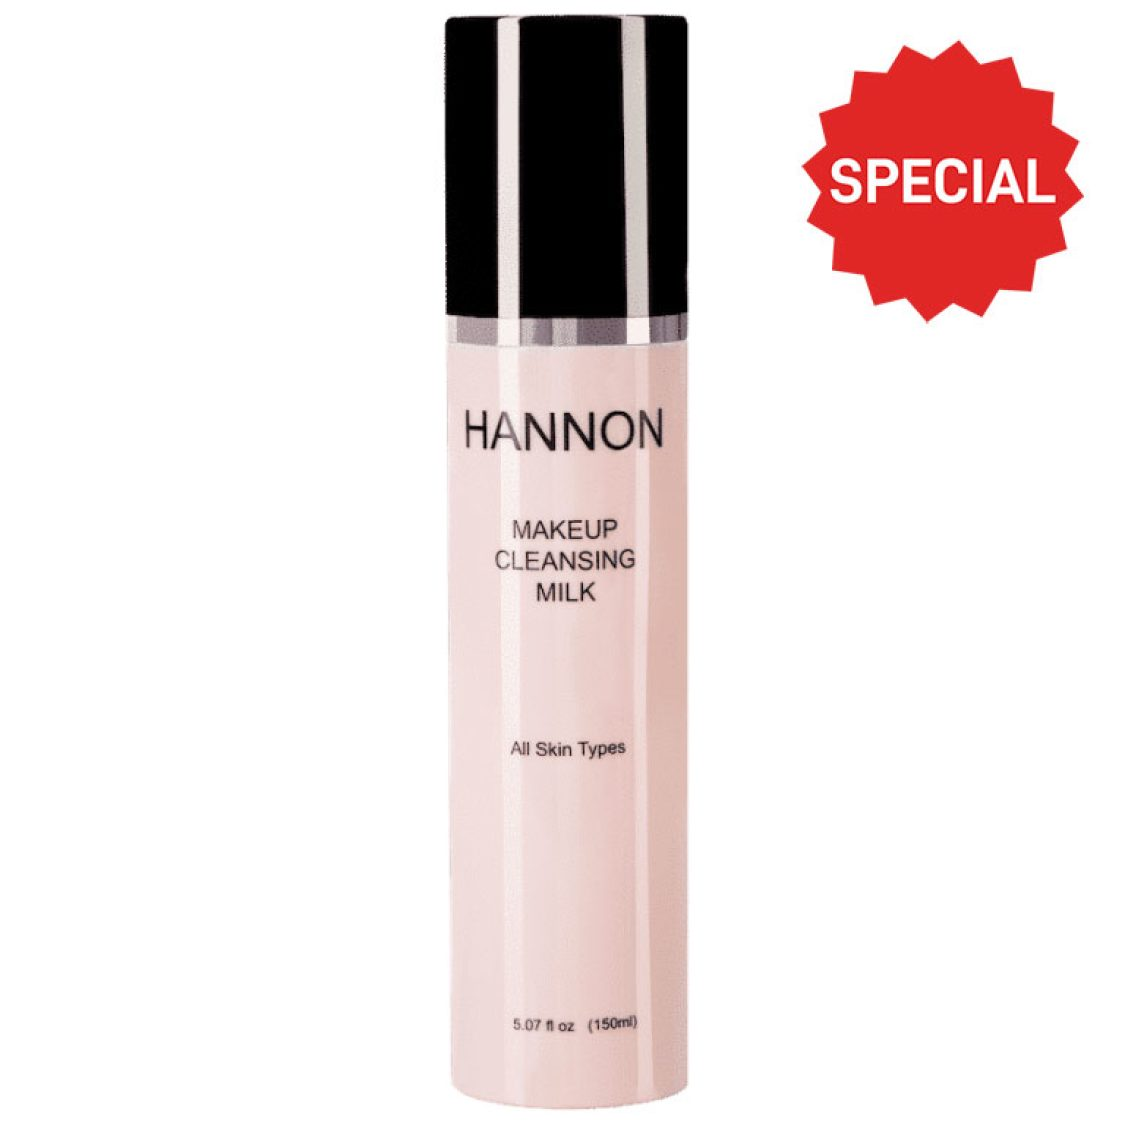 Hannon - Makeup Cleansing Milk 150ml